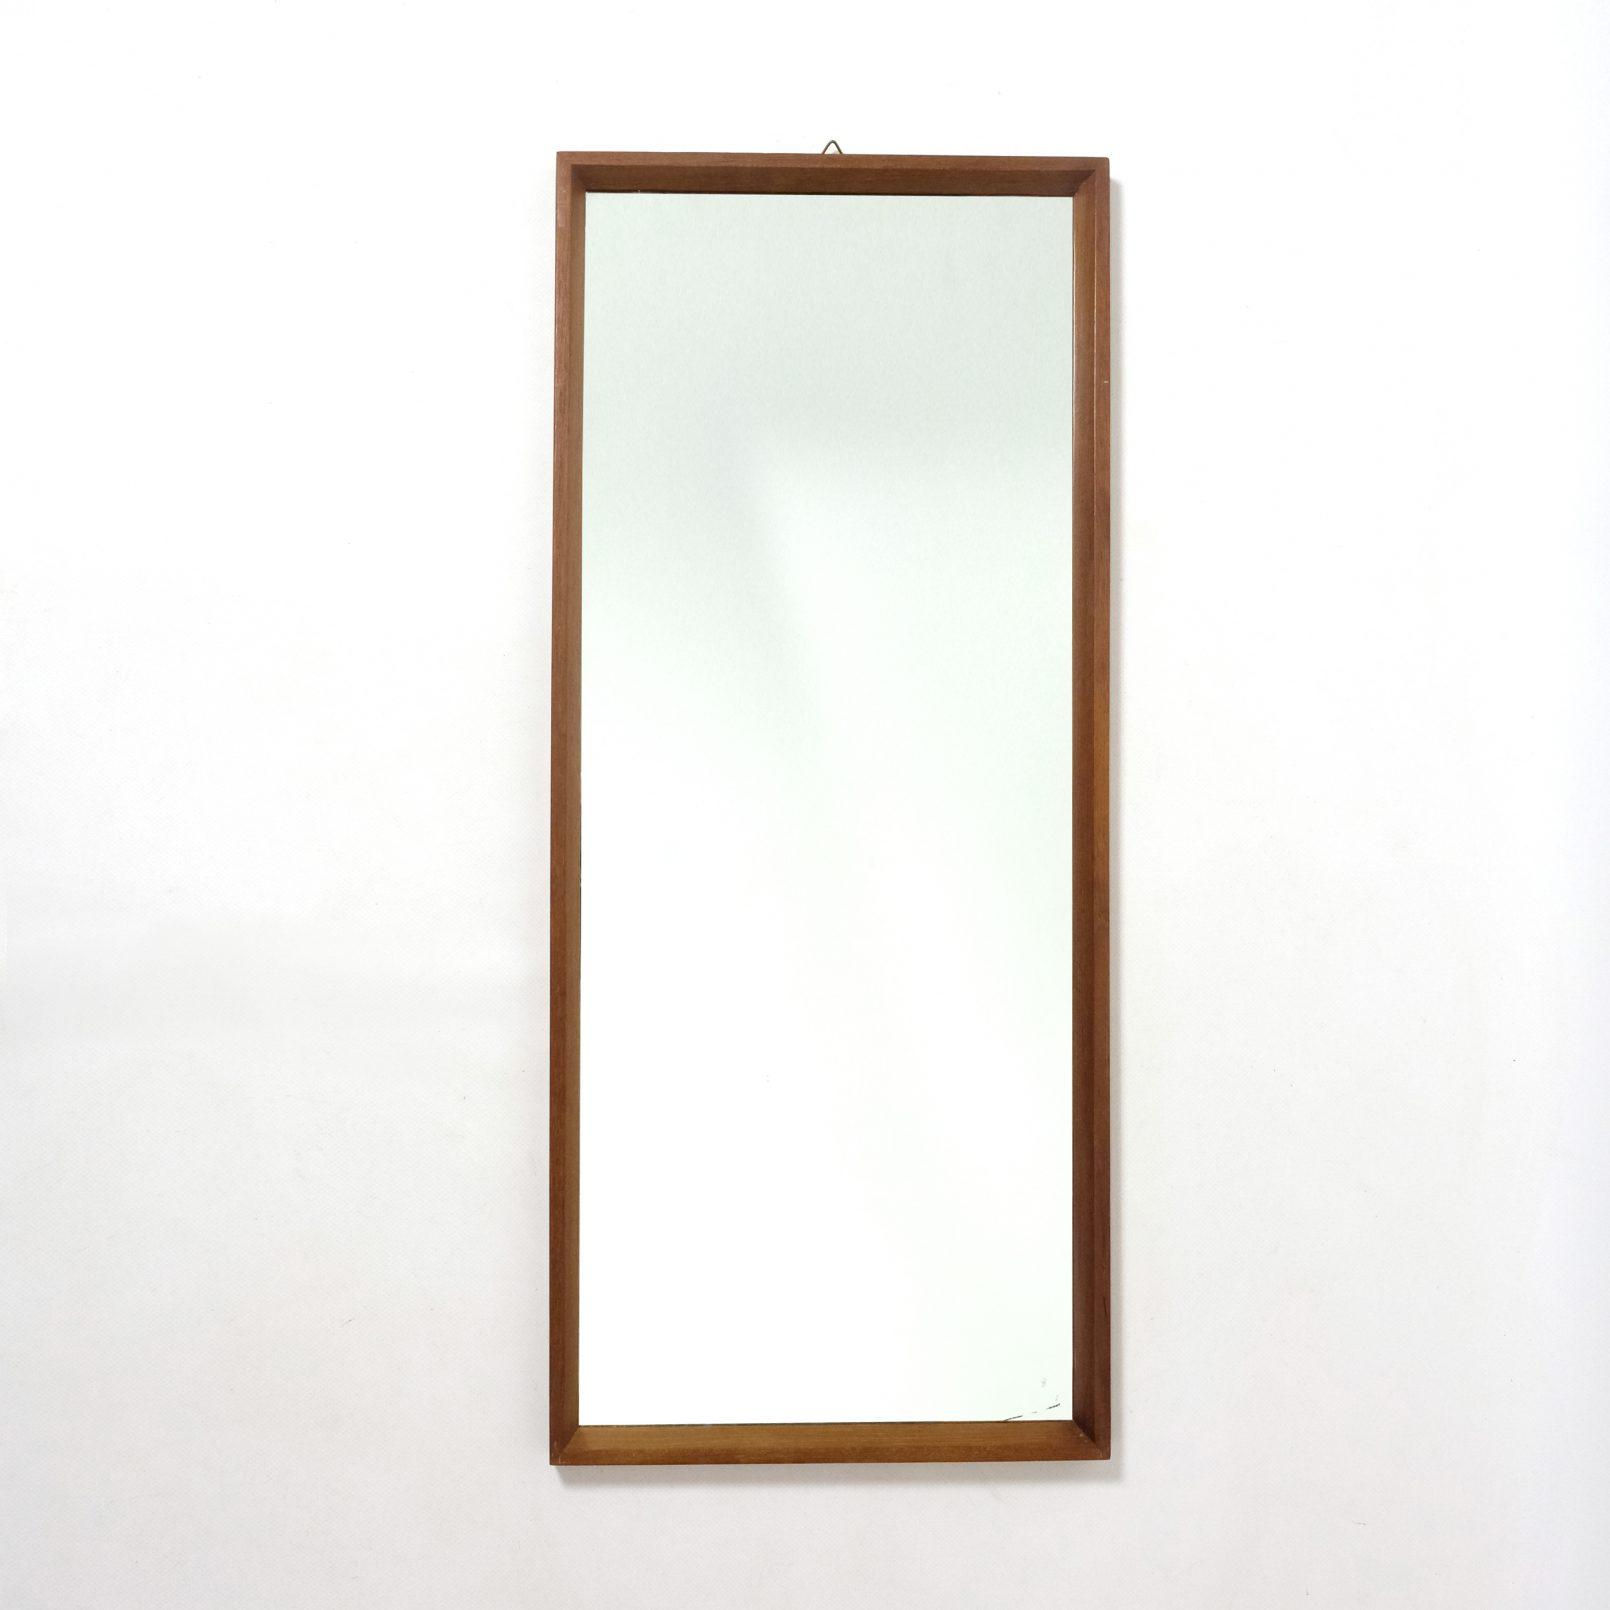 Large scandinavian mirror, 1960s, 74x32cm.